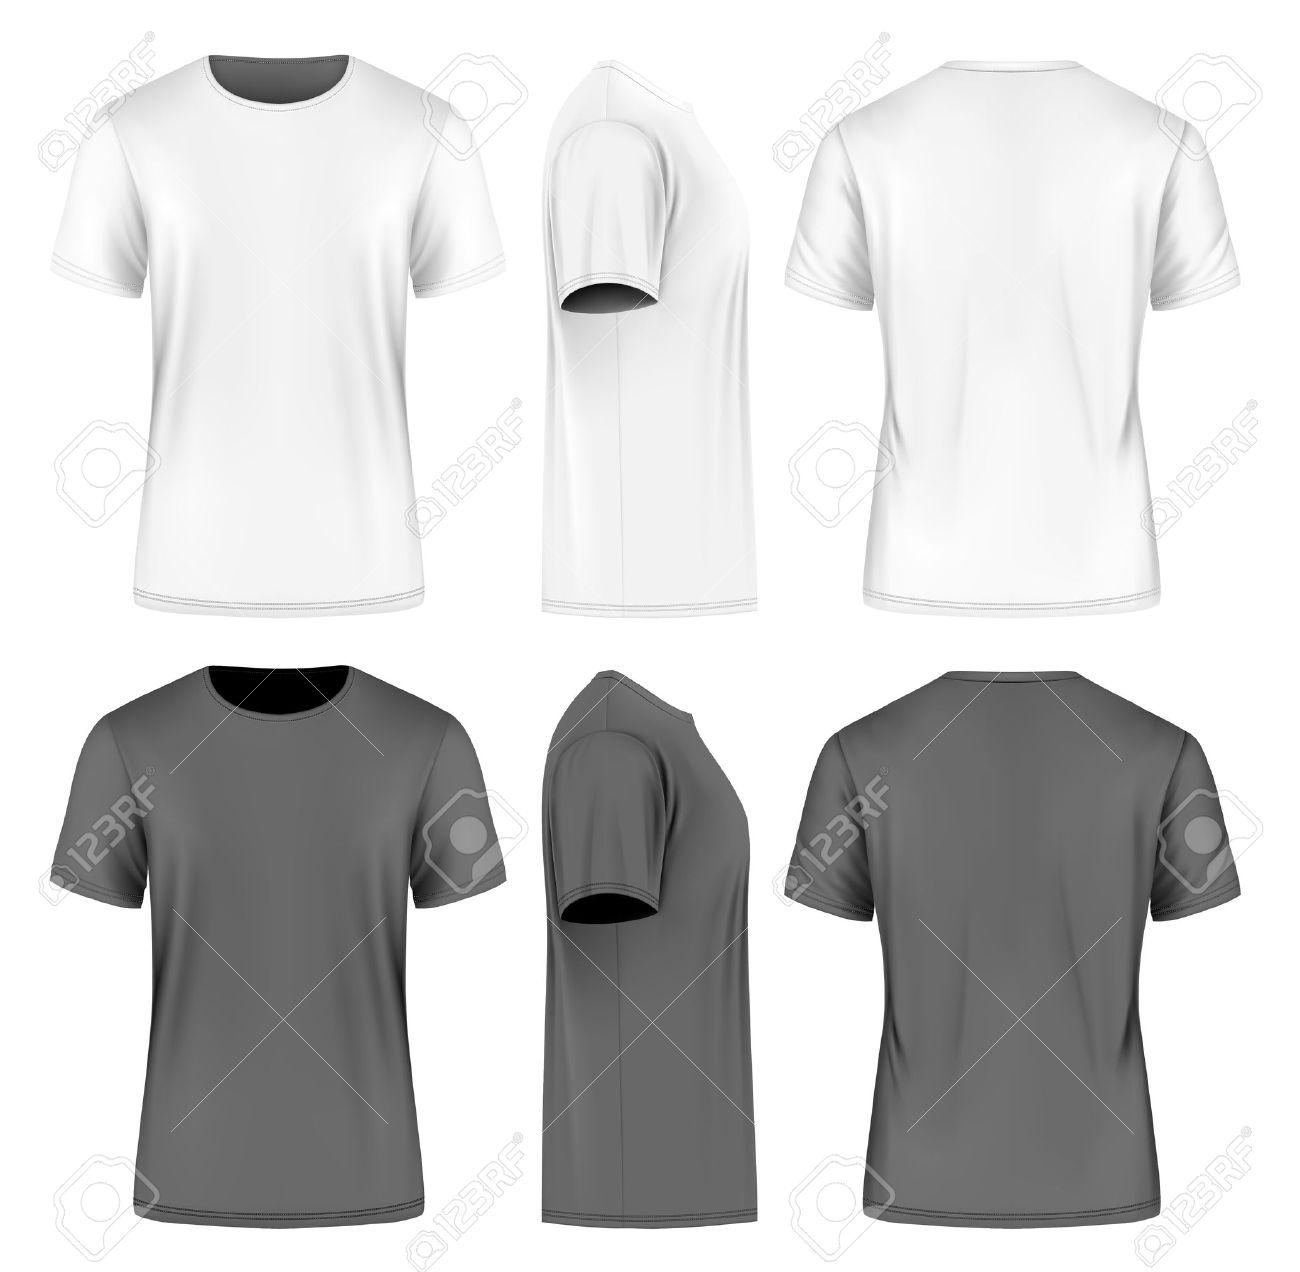 Men short sleeve t-shirt . Front, side and back views. Vector illustration. Fully editable handmade mesh. Black and white variants. - 52421410